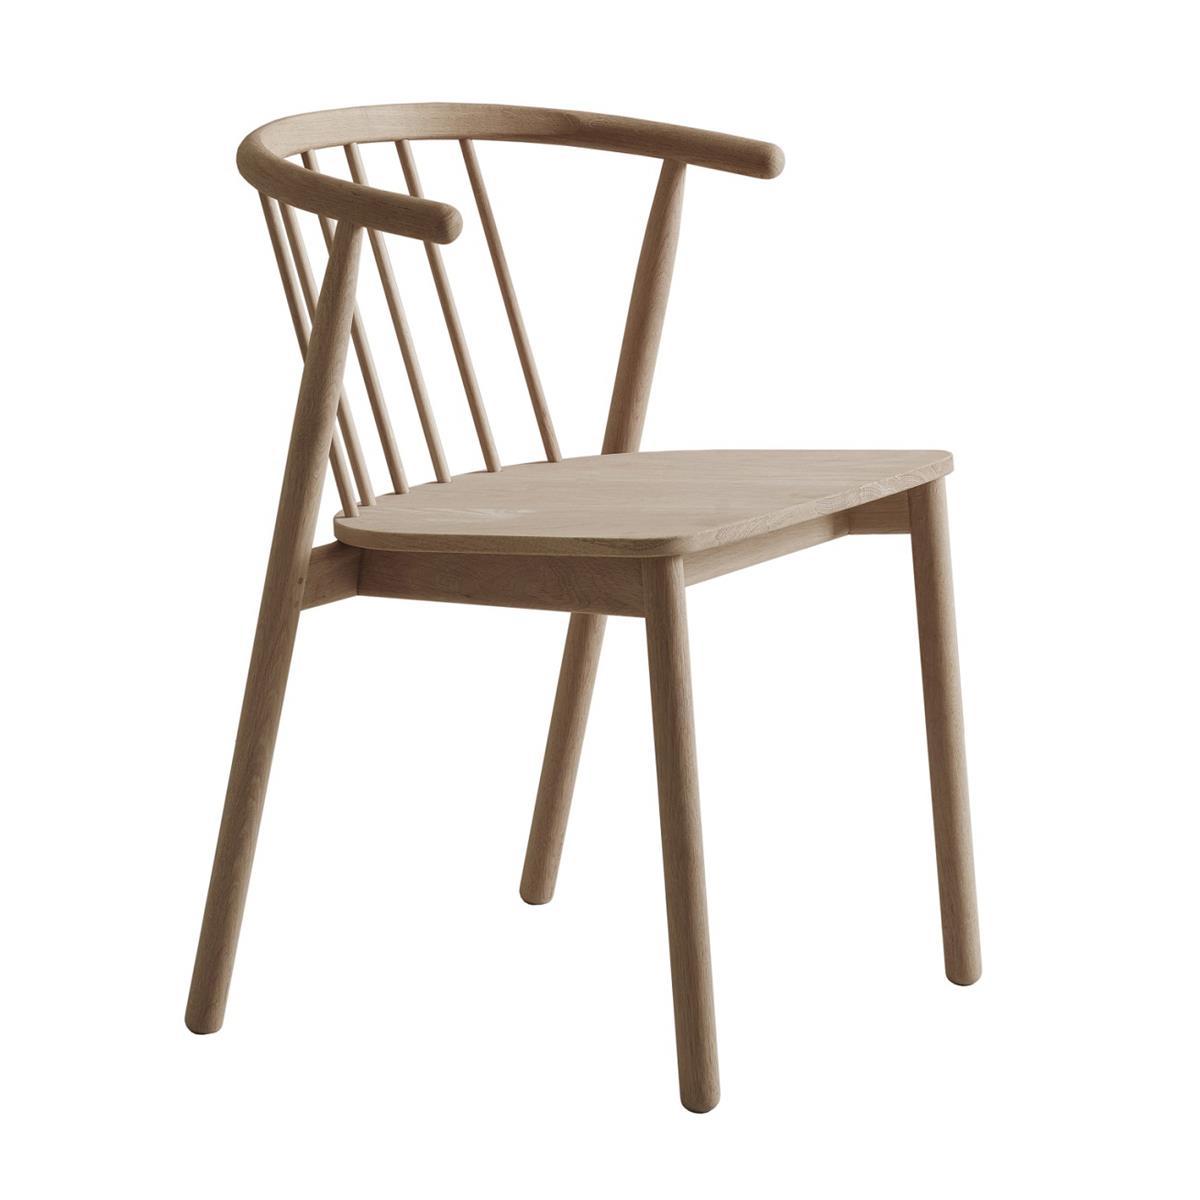 Tonning & Stryn | Vang stol